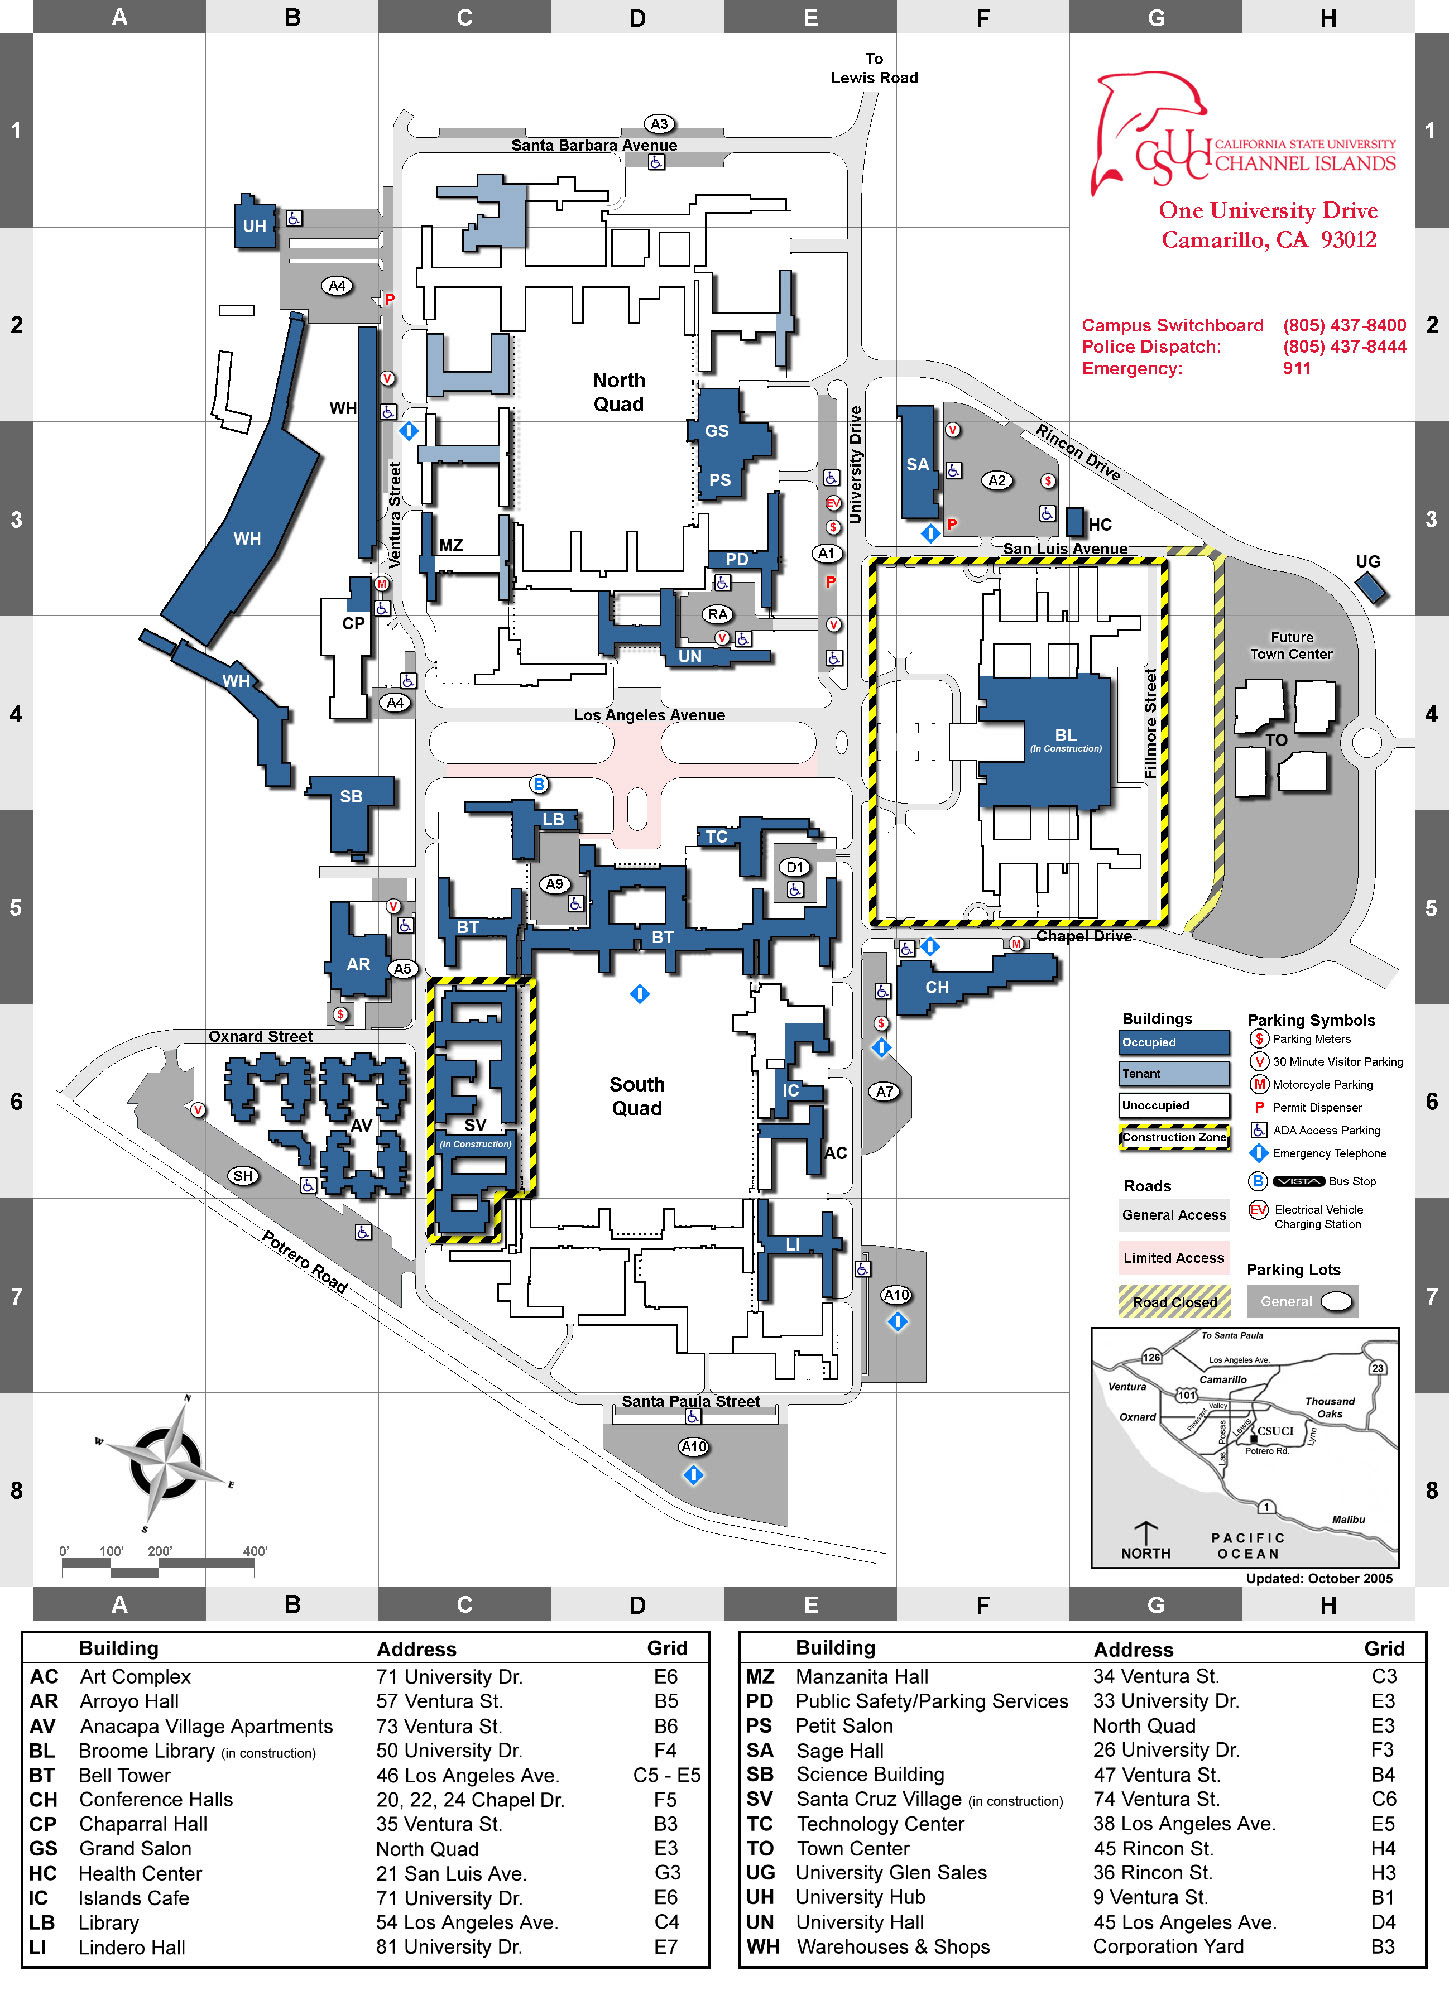 Csu Channel Islands Campus Map Csuci Map | Color 2018